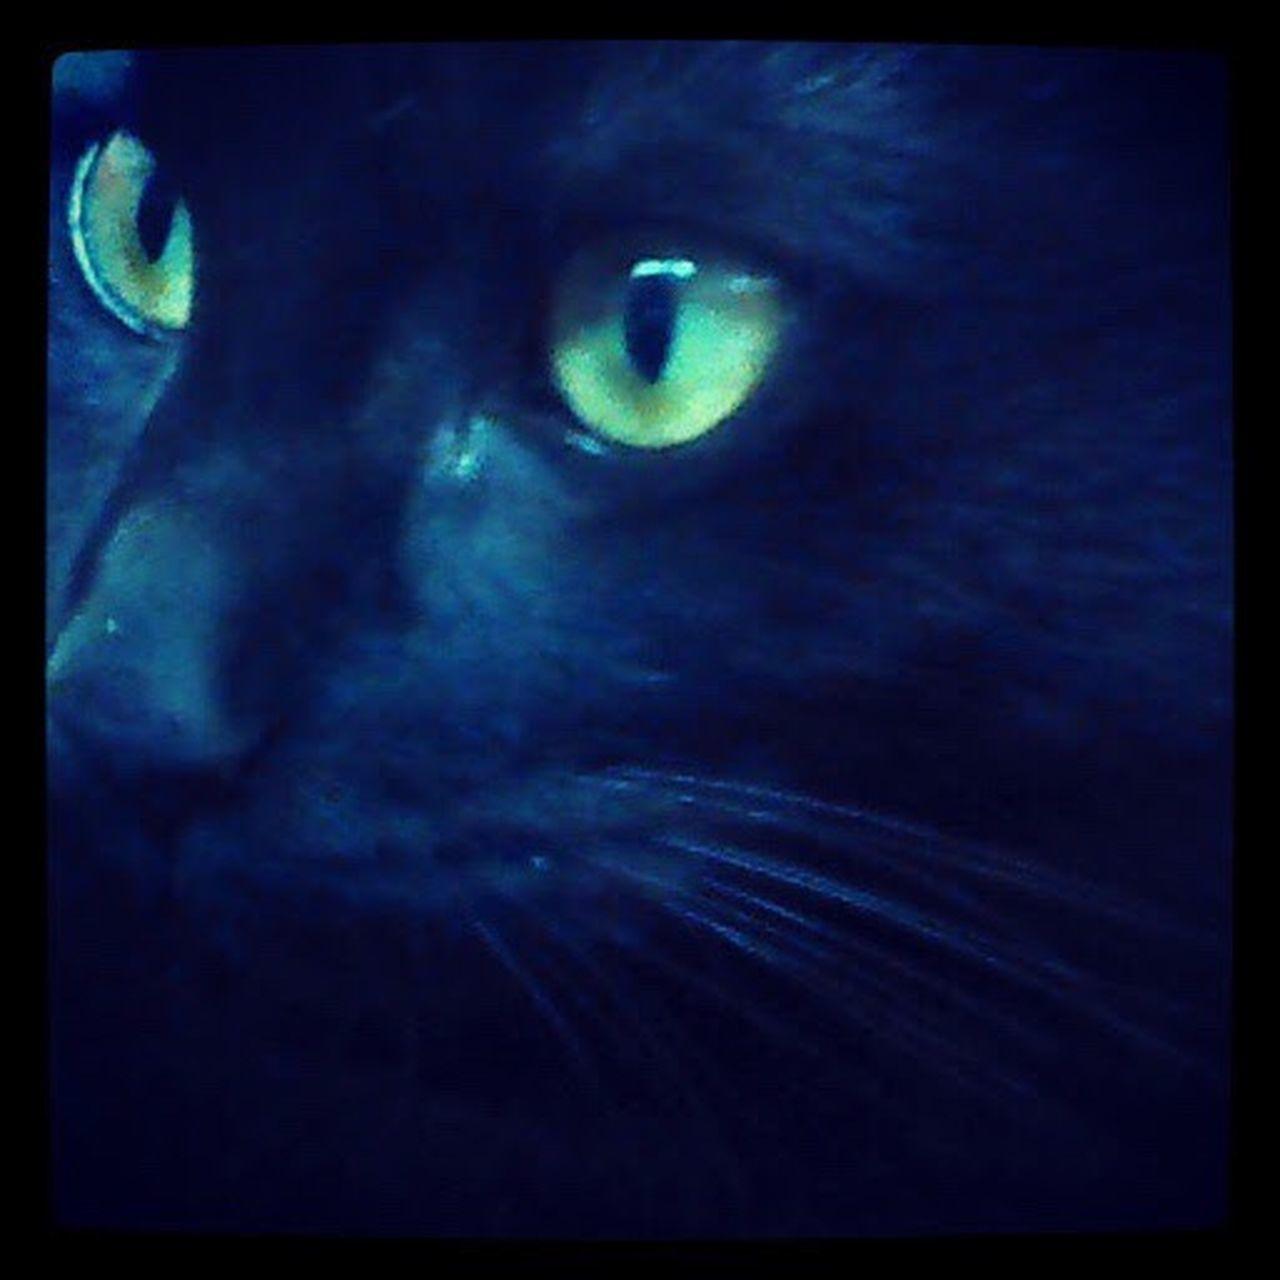 Feline One Animal Close-up Domestic Animals BLackCat Cateyes